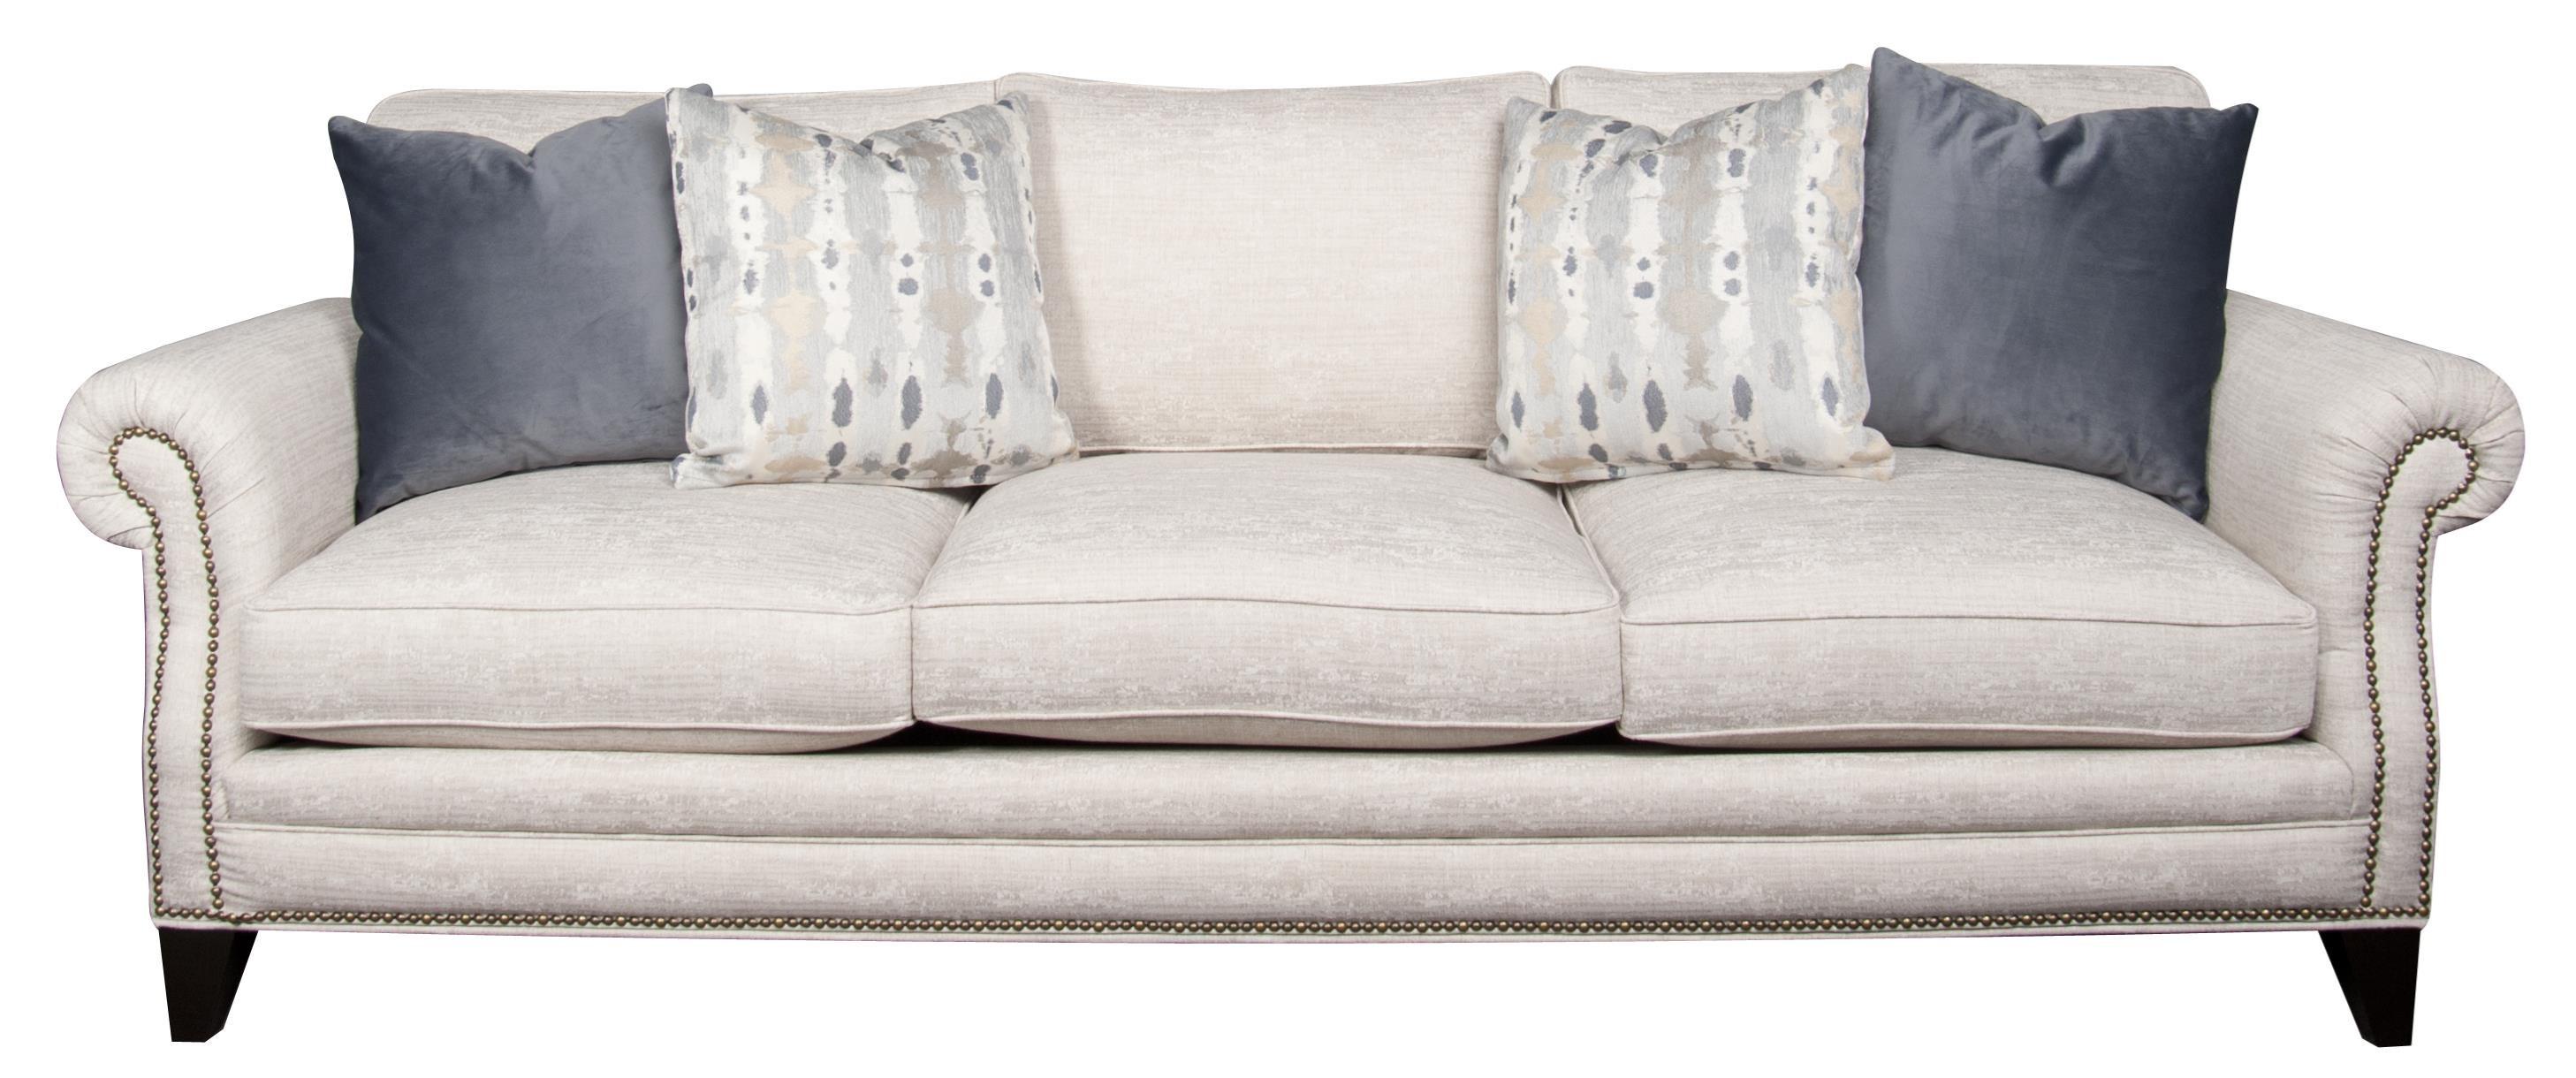 Morris Home Furnishings Helen - Helen Sofa - Item Number: 154934105